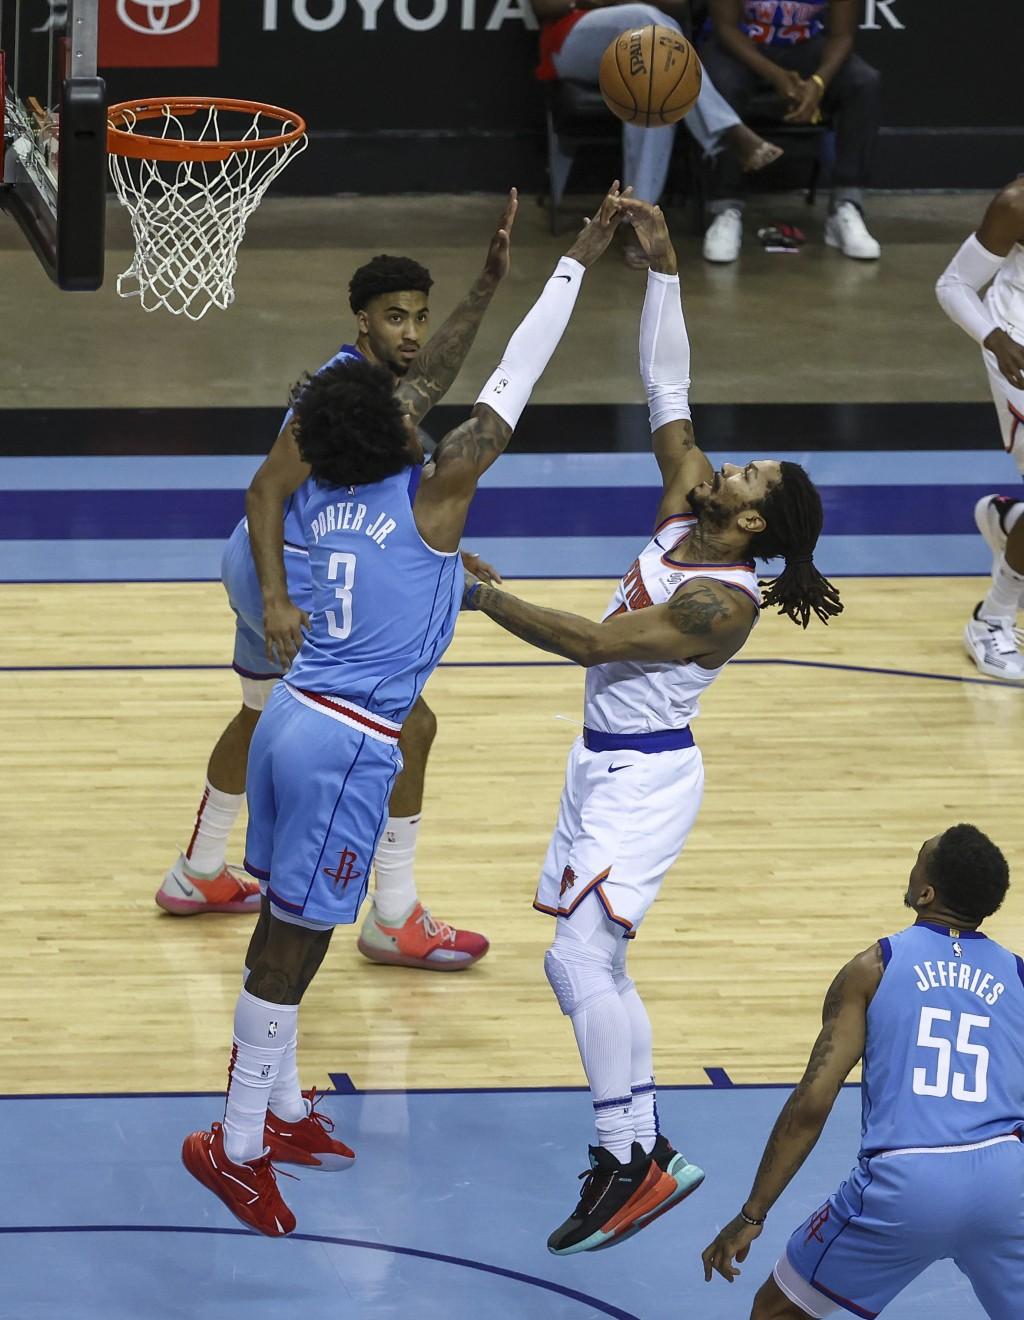 New York Knicks guard Derrick Rose (4) shoots the ball as Houston Rockets guard Kevin Porter Jr. (3) defends during the first quarter of an NBA basket...